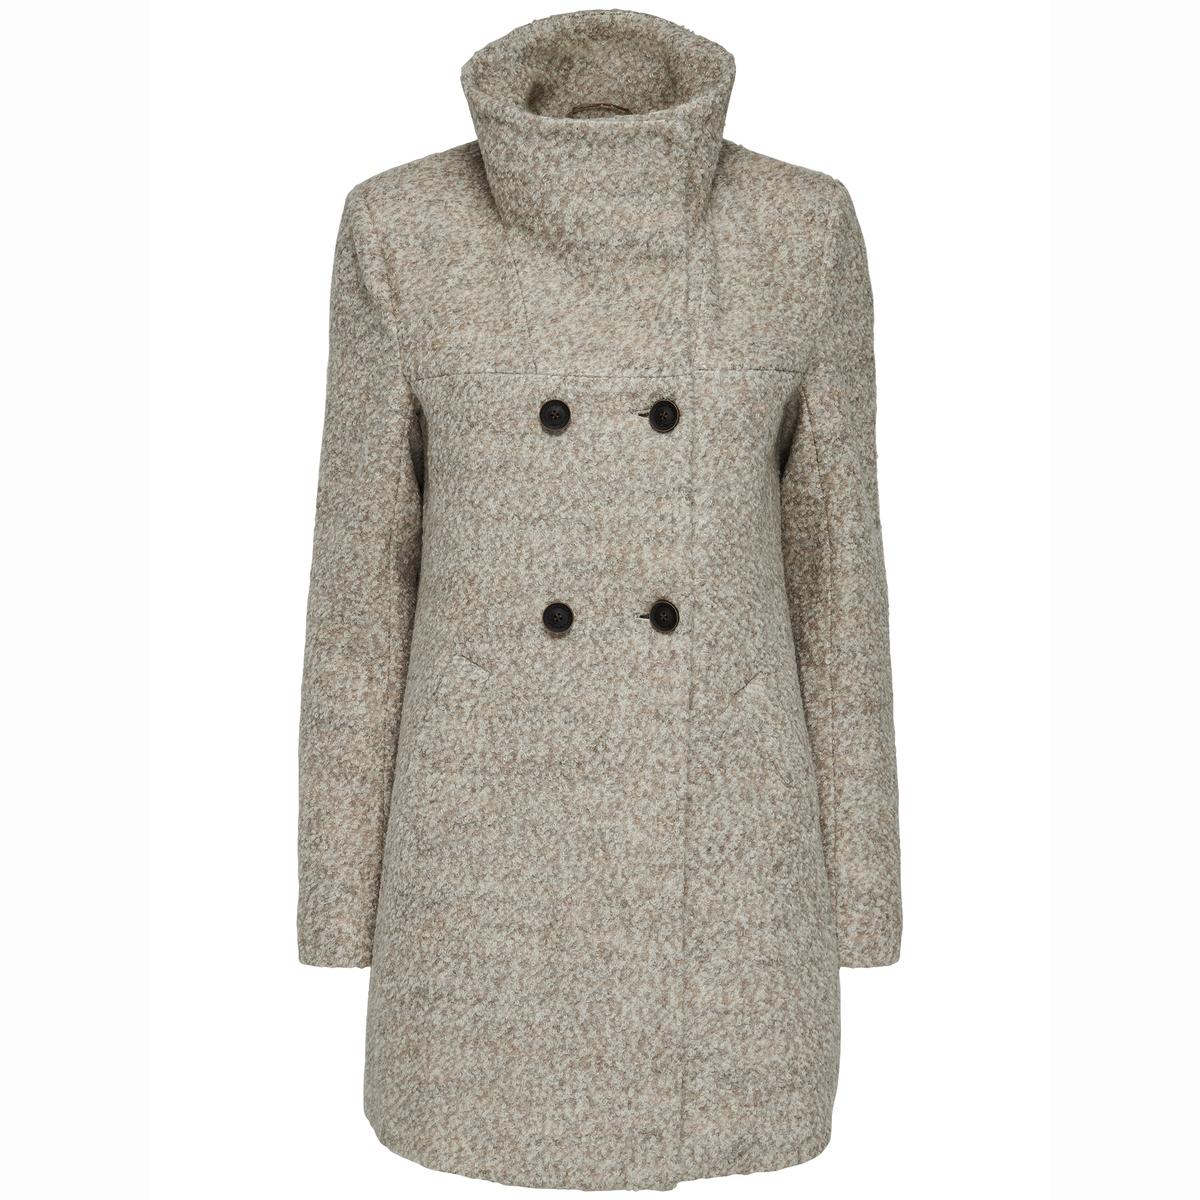 ONLY Пальто длинное, букле New Sophia